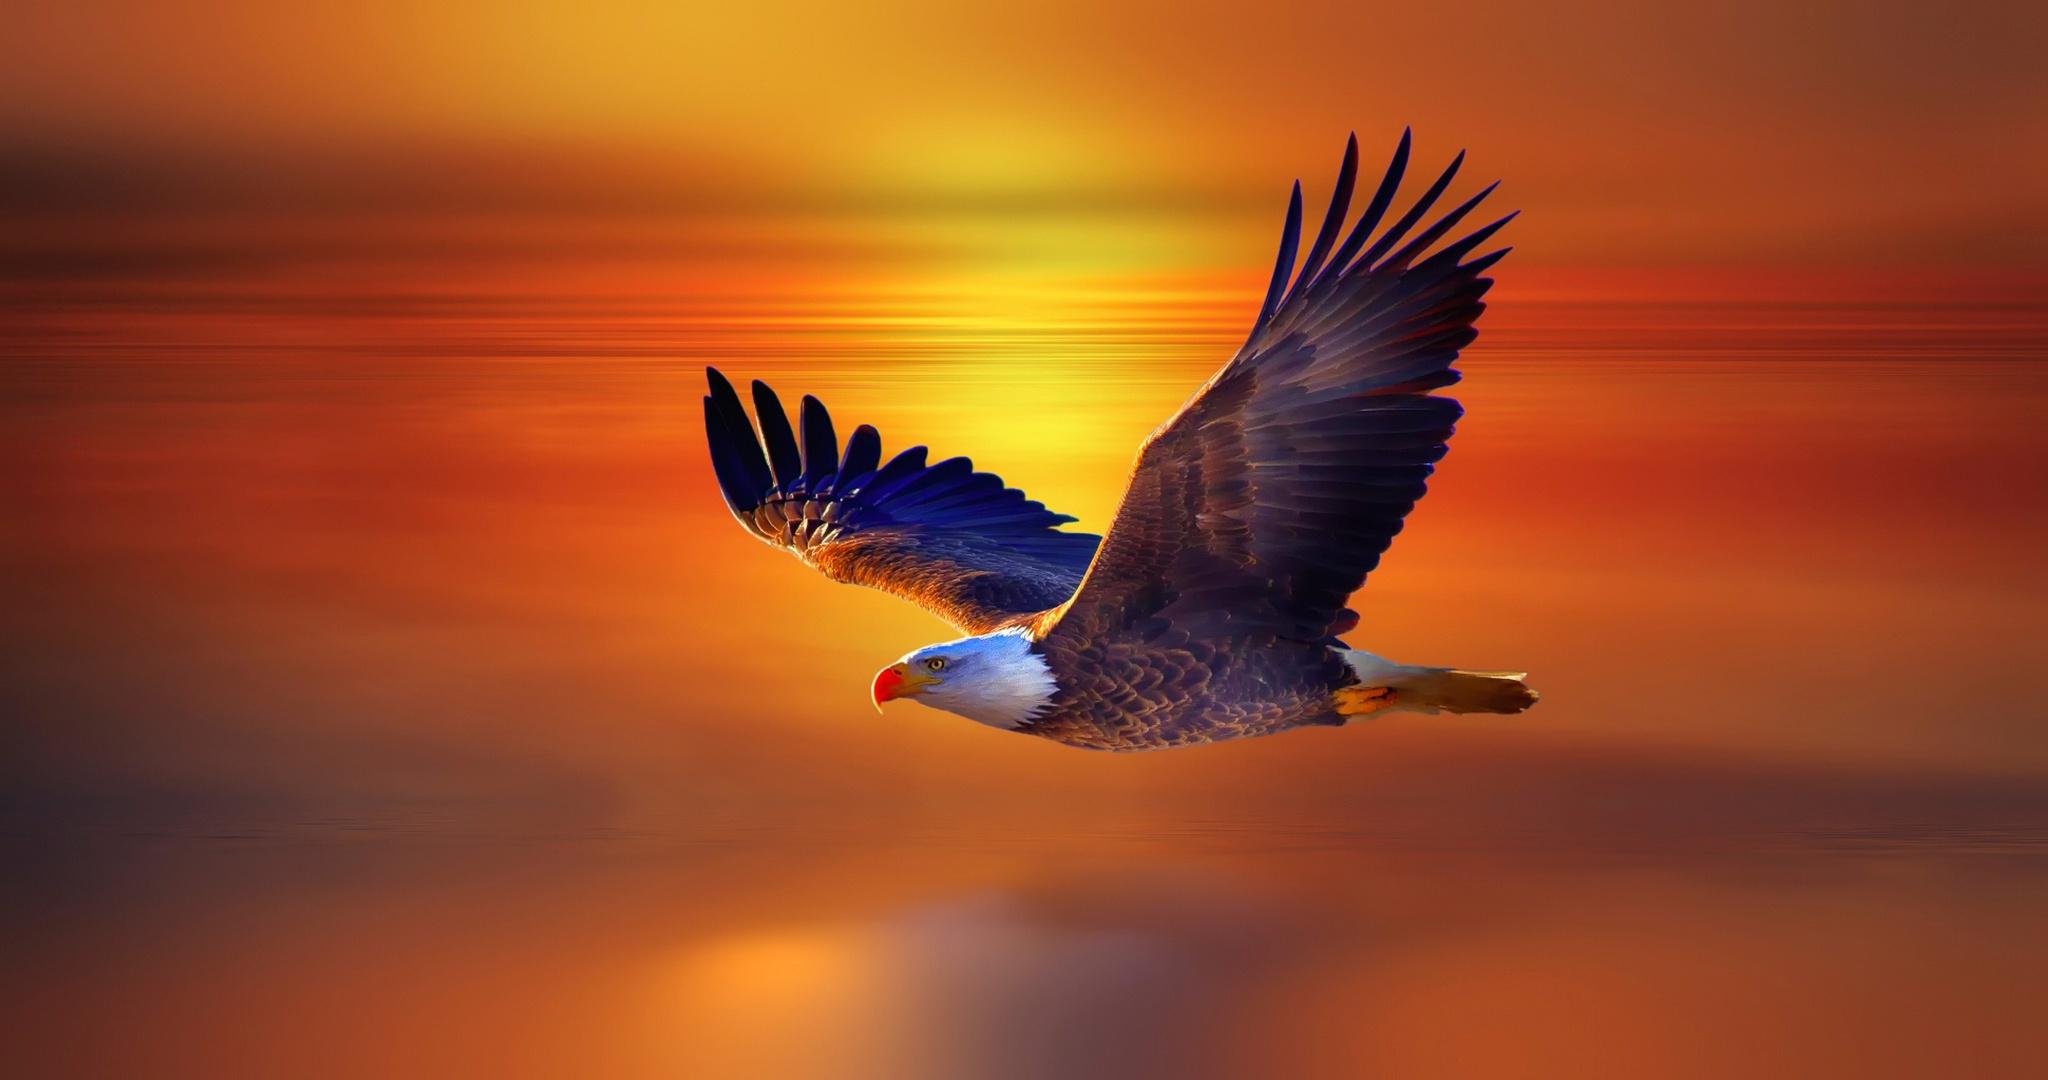 2048x1152 Bald Eagle 2048x1152 Resolution Hd 4k Wallpapers